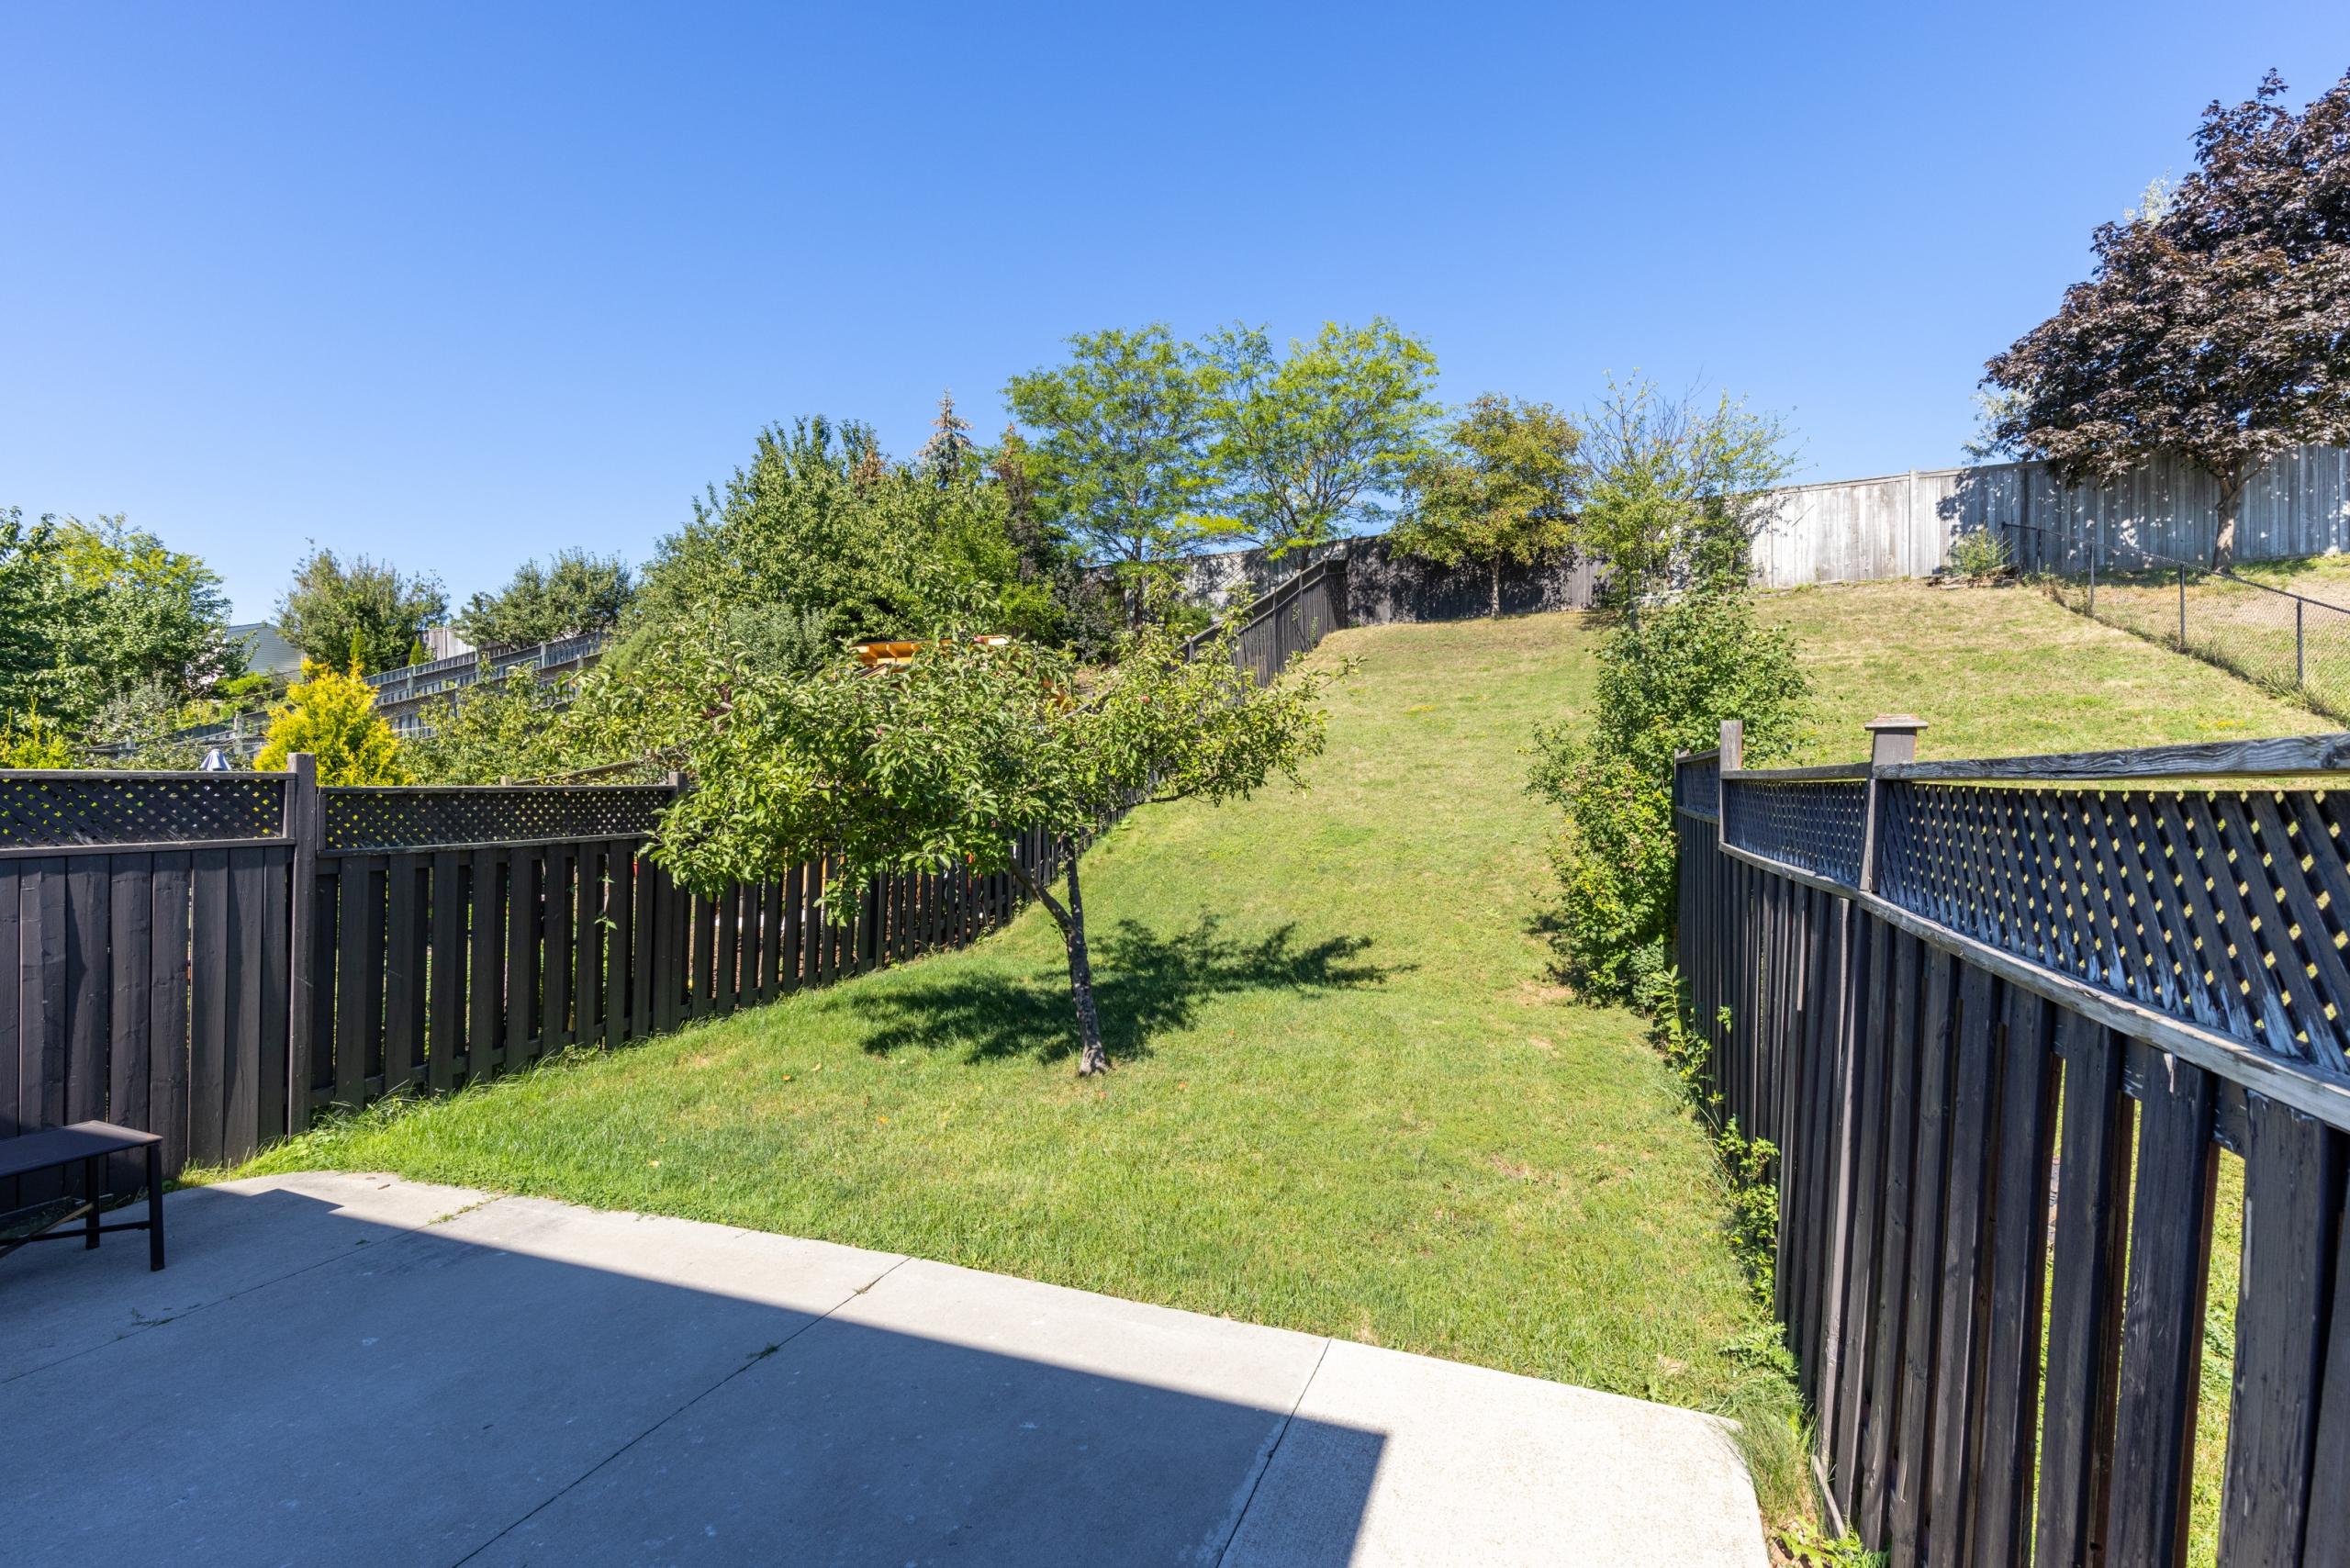 Garden featured at 343 Wildgrass Road, Mississauga, ON at Alex Irish & Associates